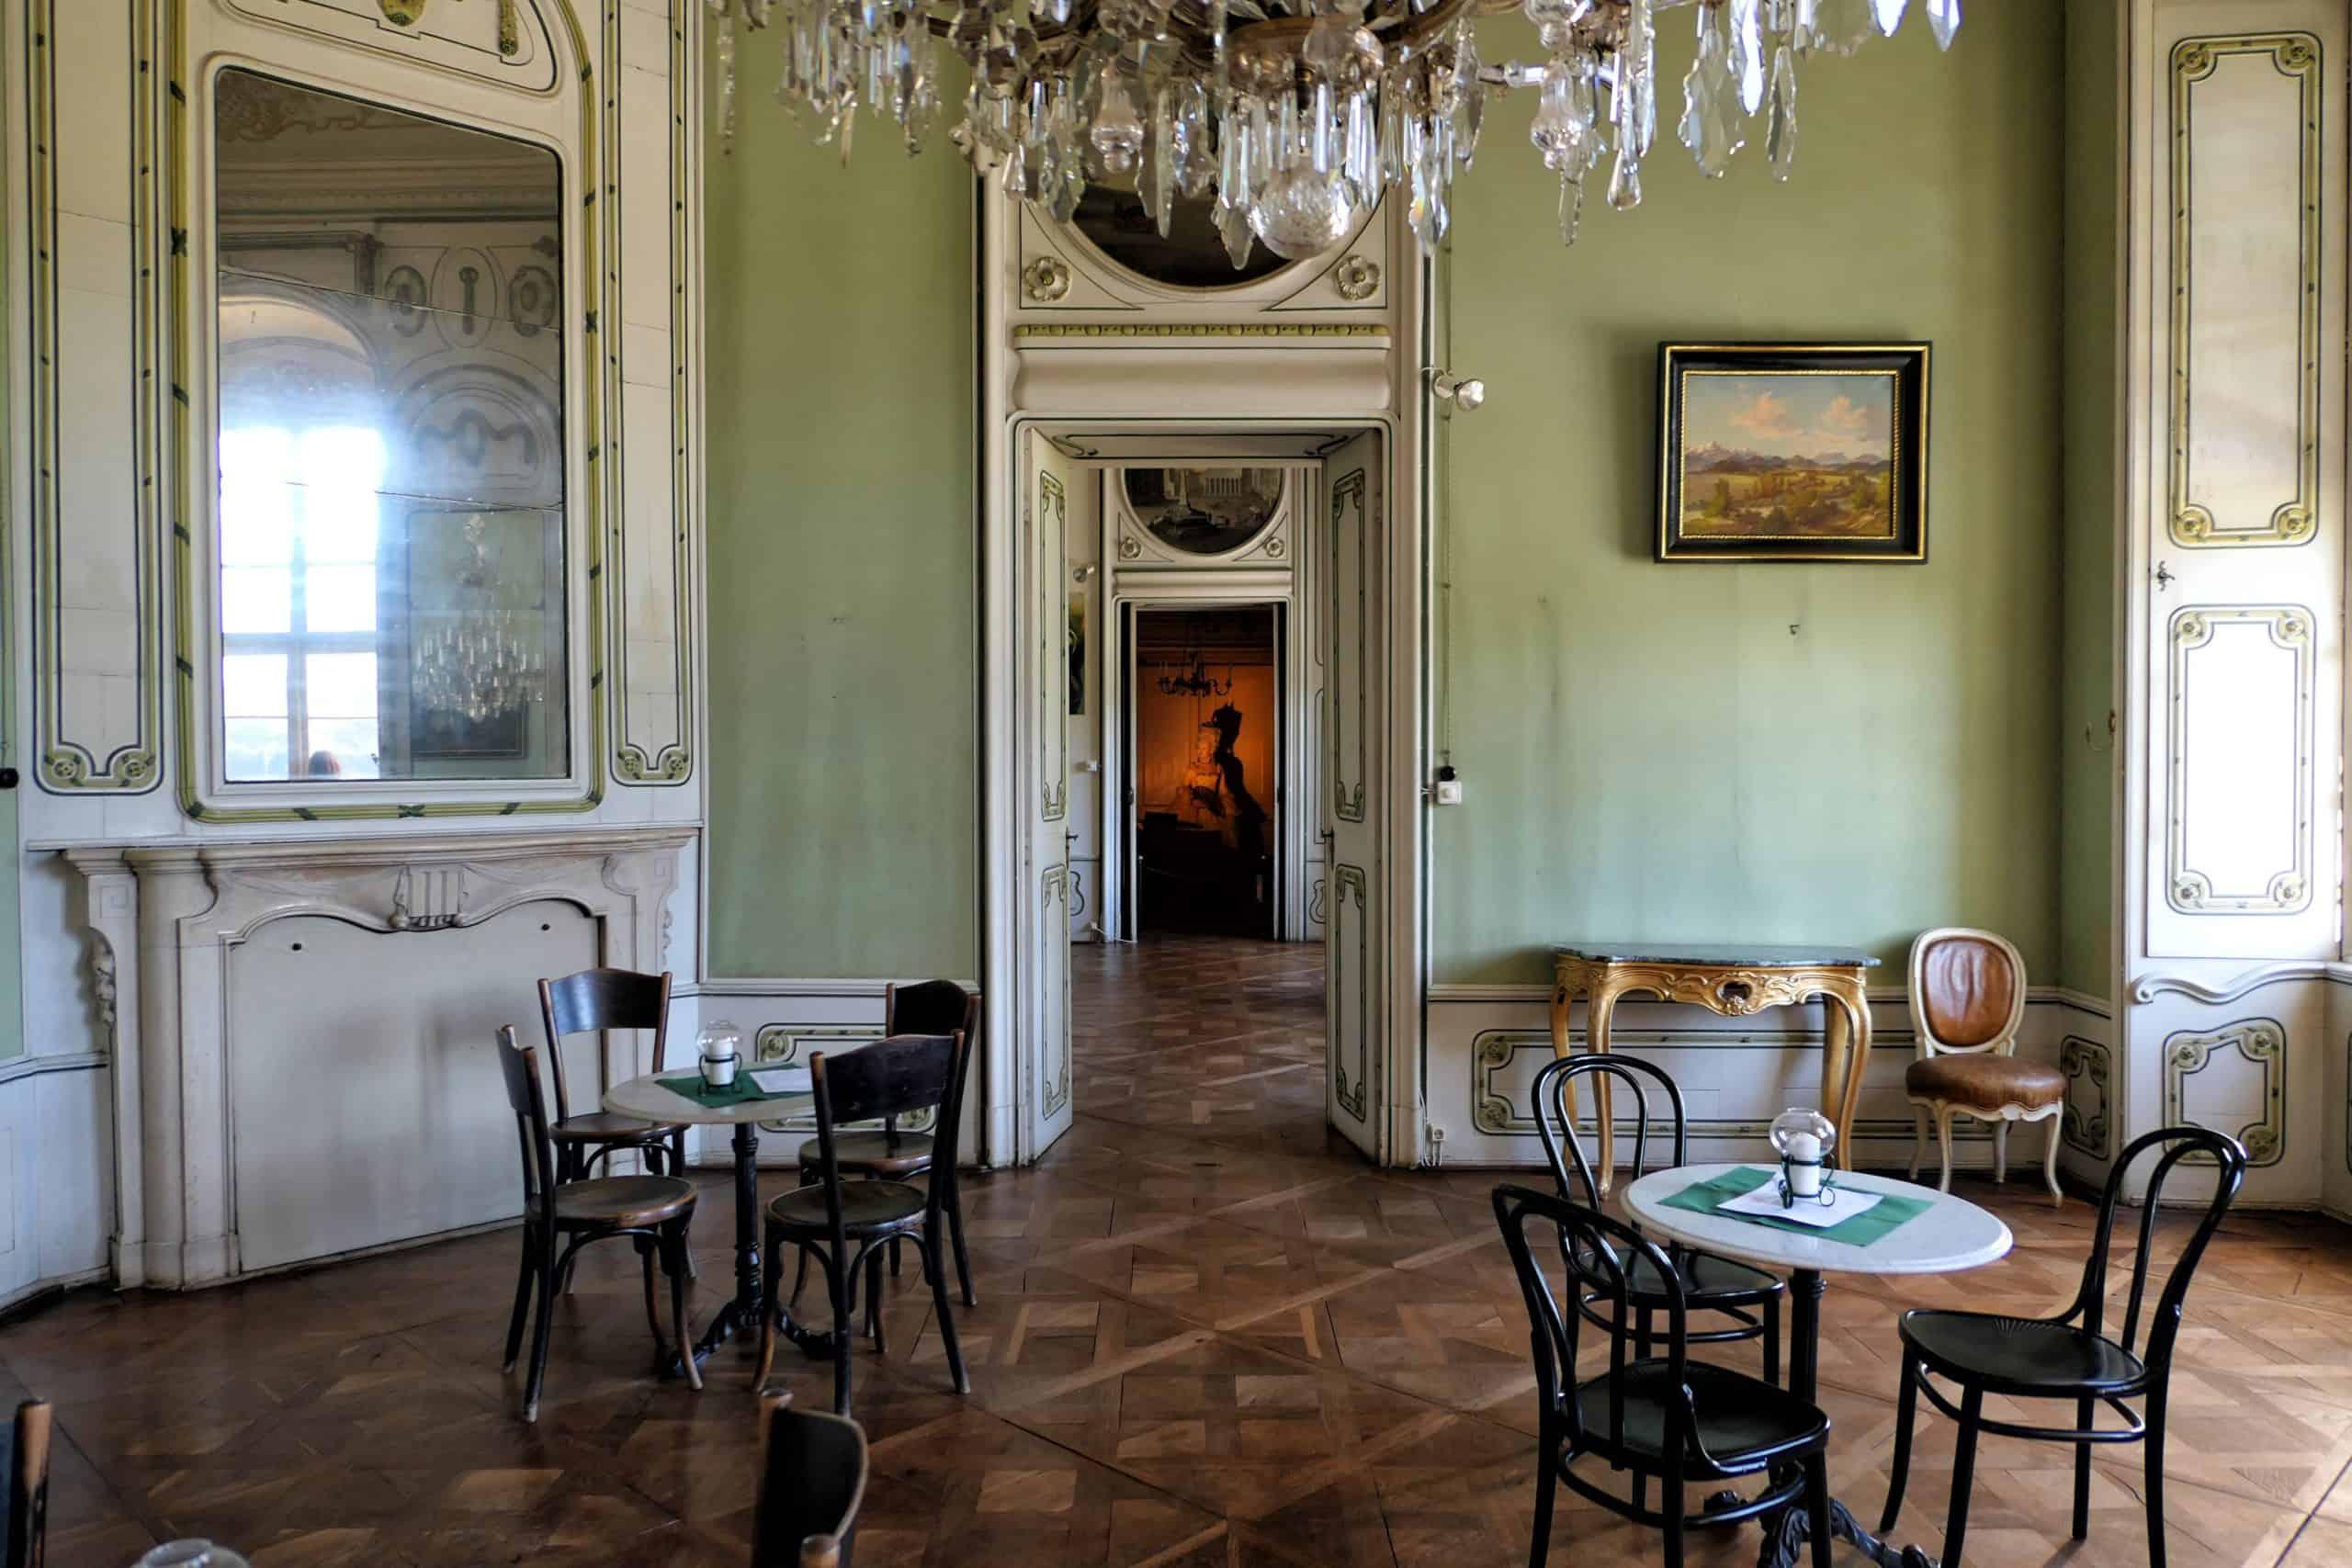 Kaffeehaus im Schloss Rosegg in Kärnten - Rosental, Österreich